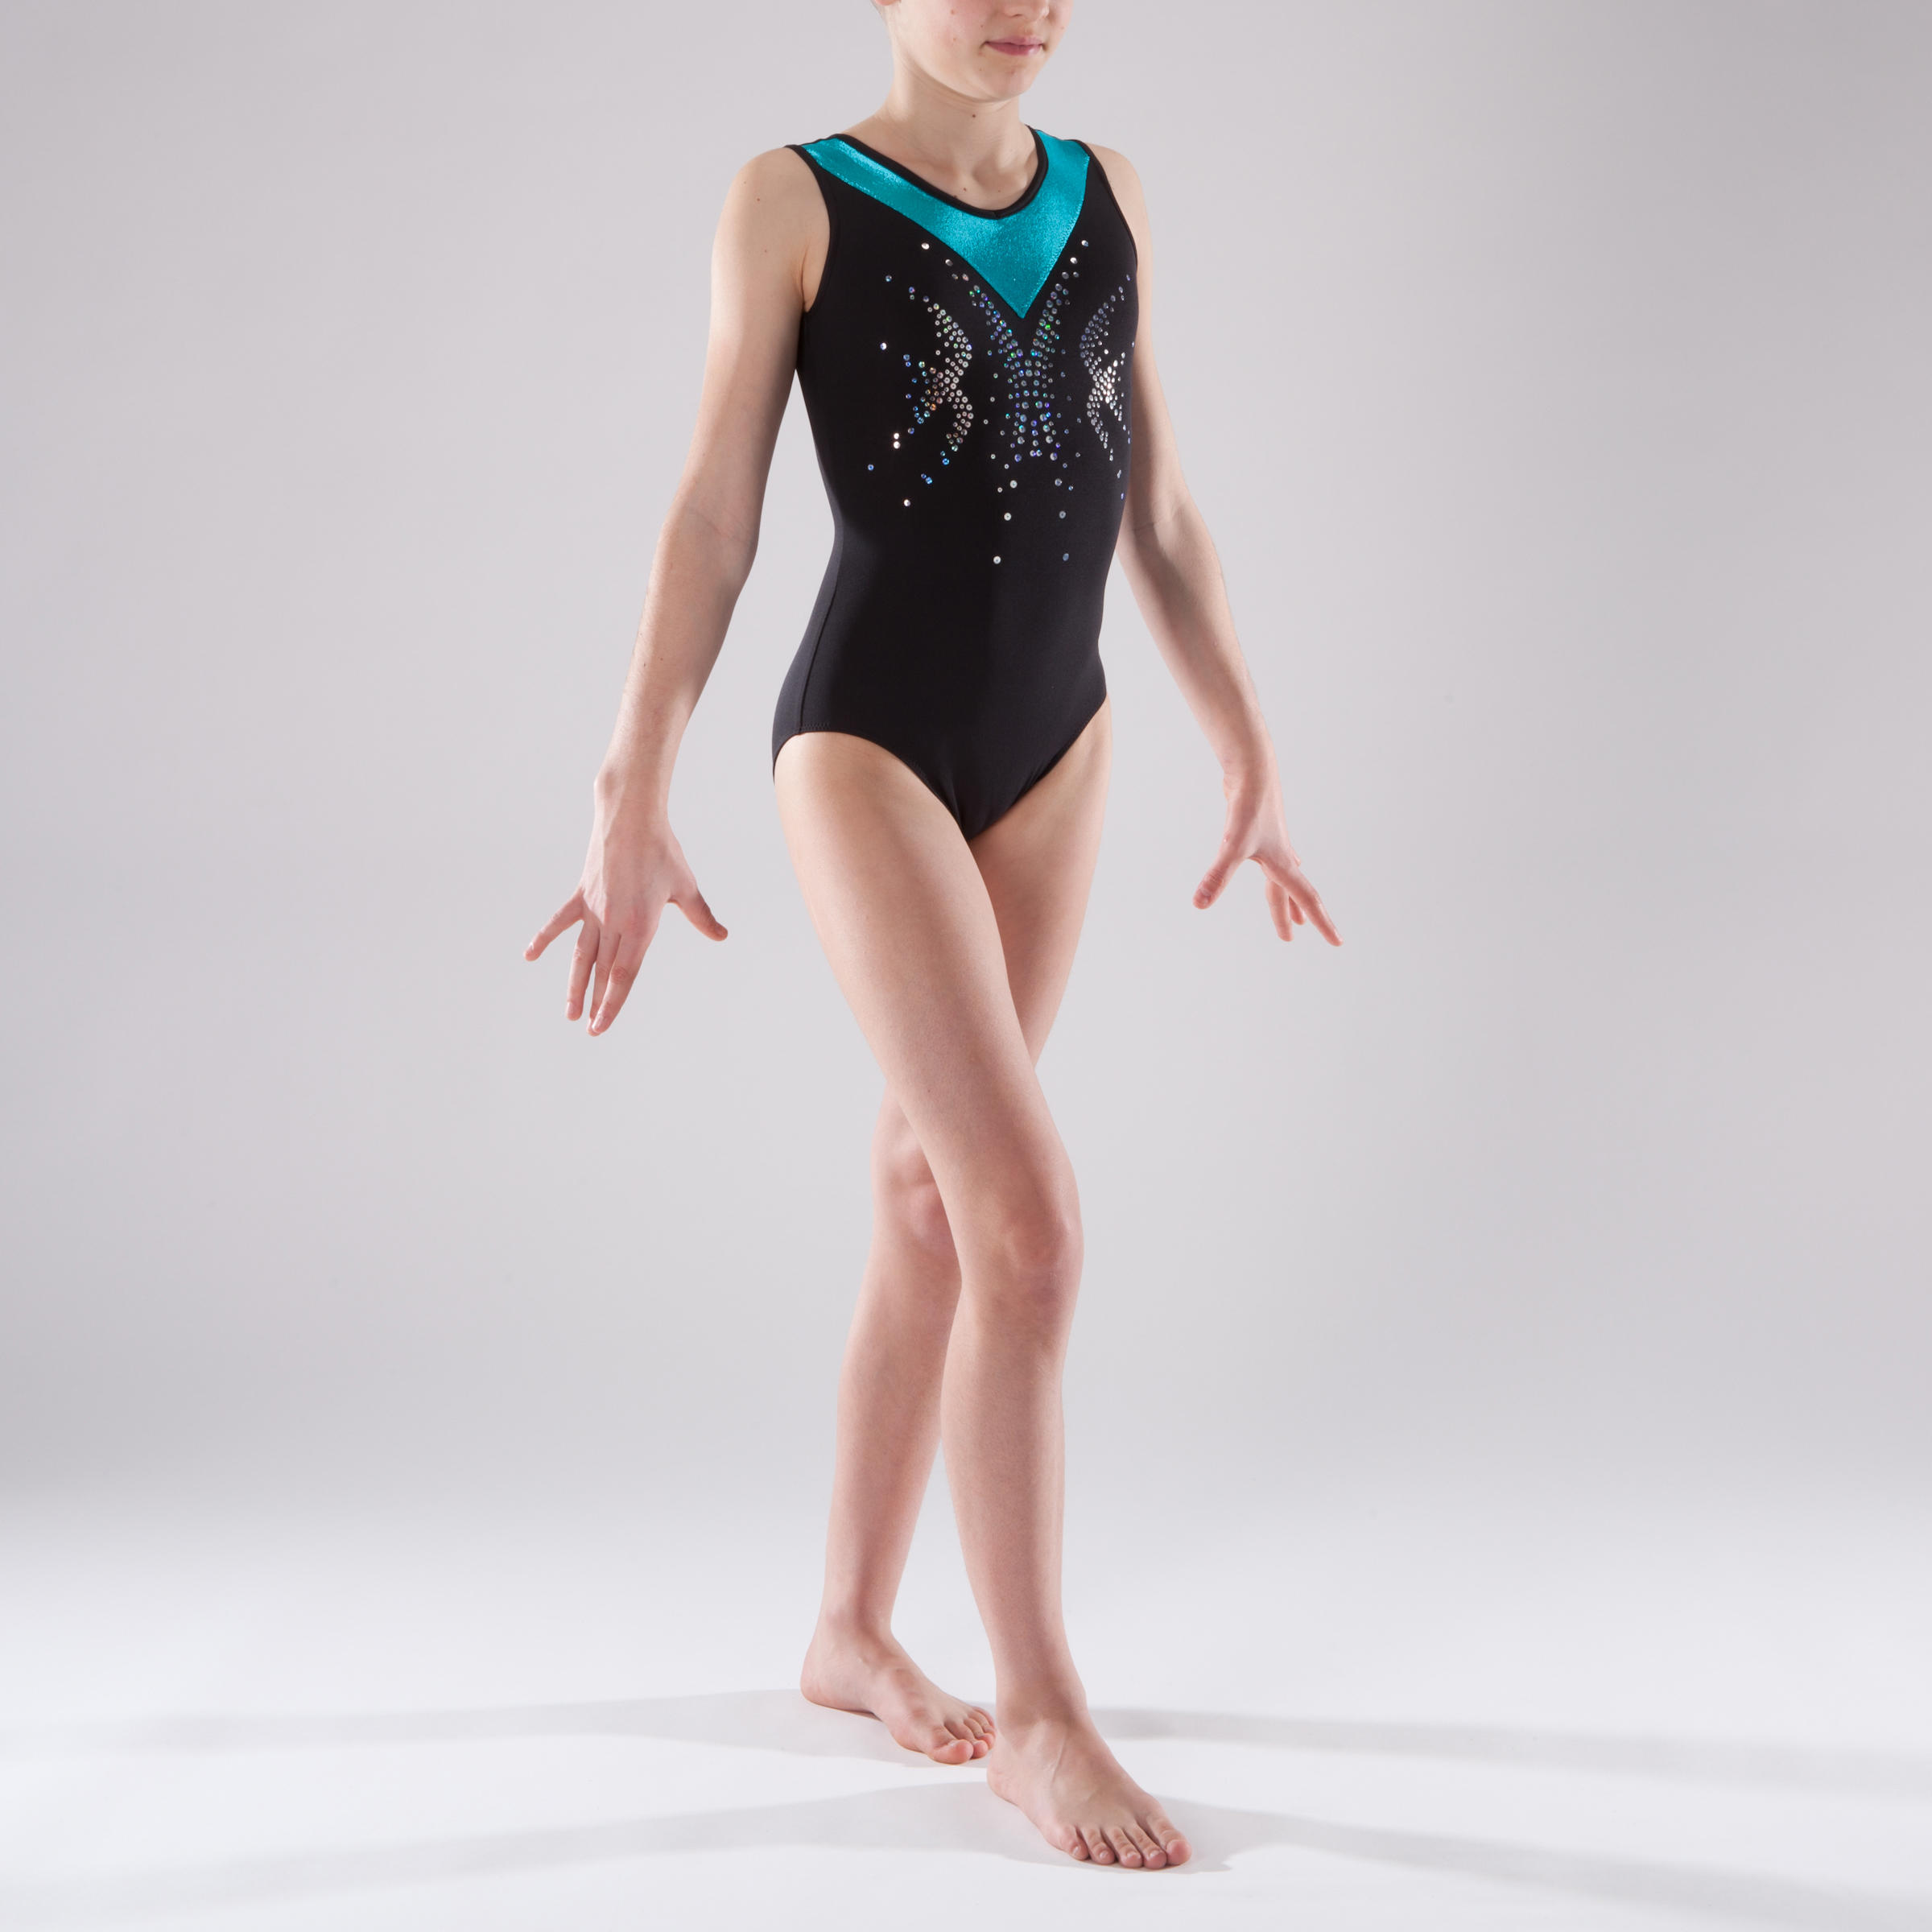 Girls' Sleeveless Gym Leotard - Black/Turquoise/Sequins